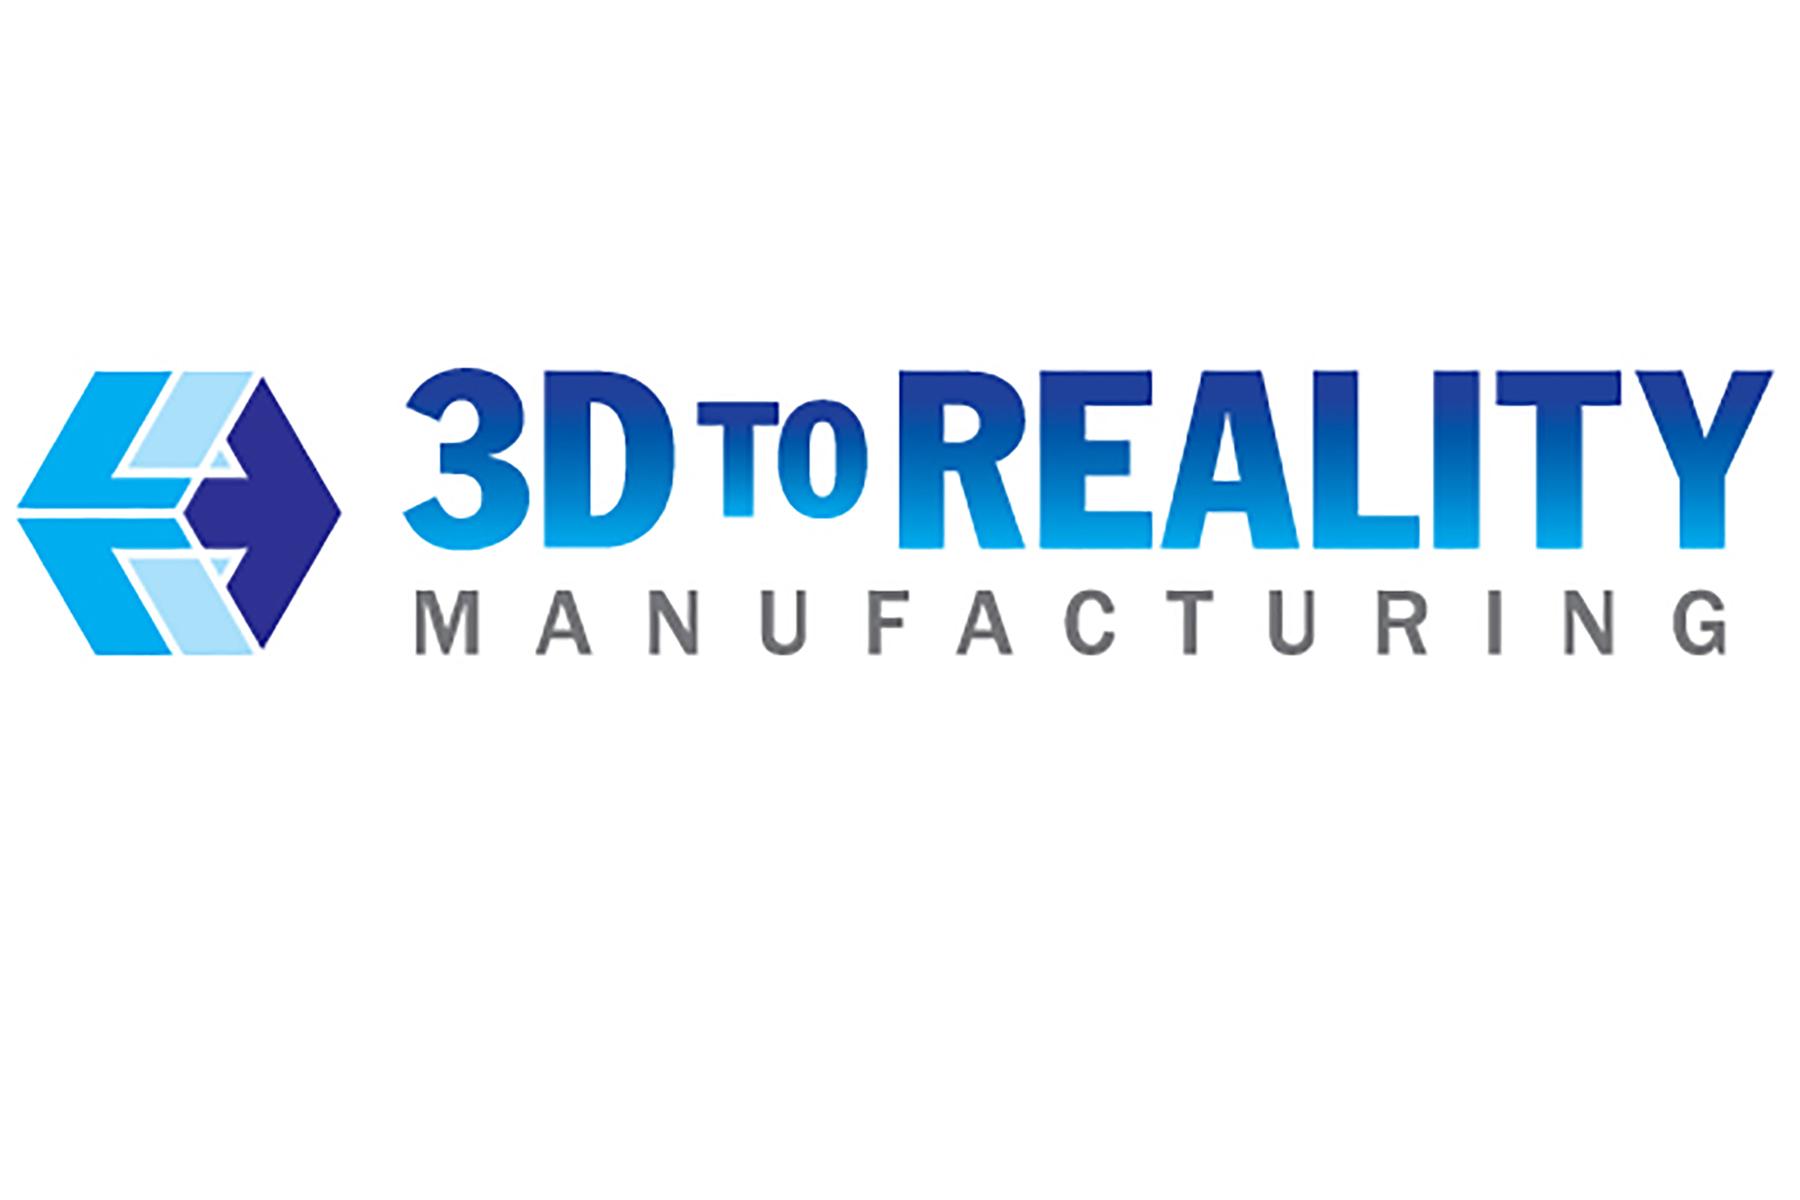 3DTOREALITY-LOGO